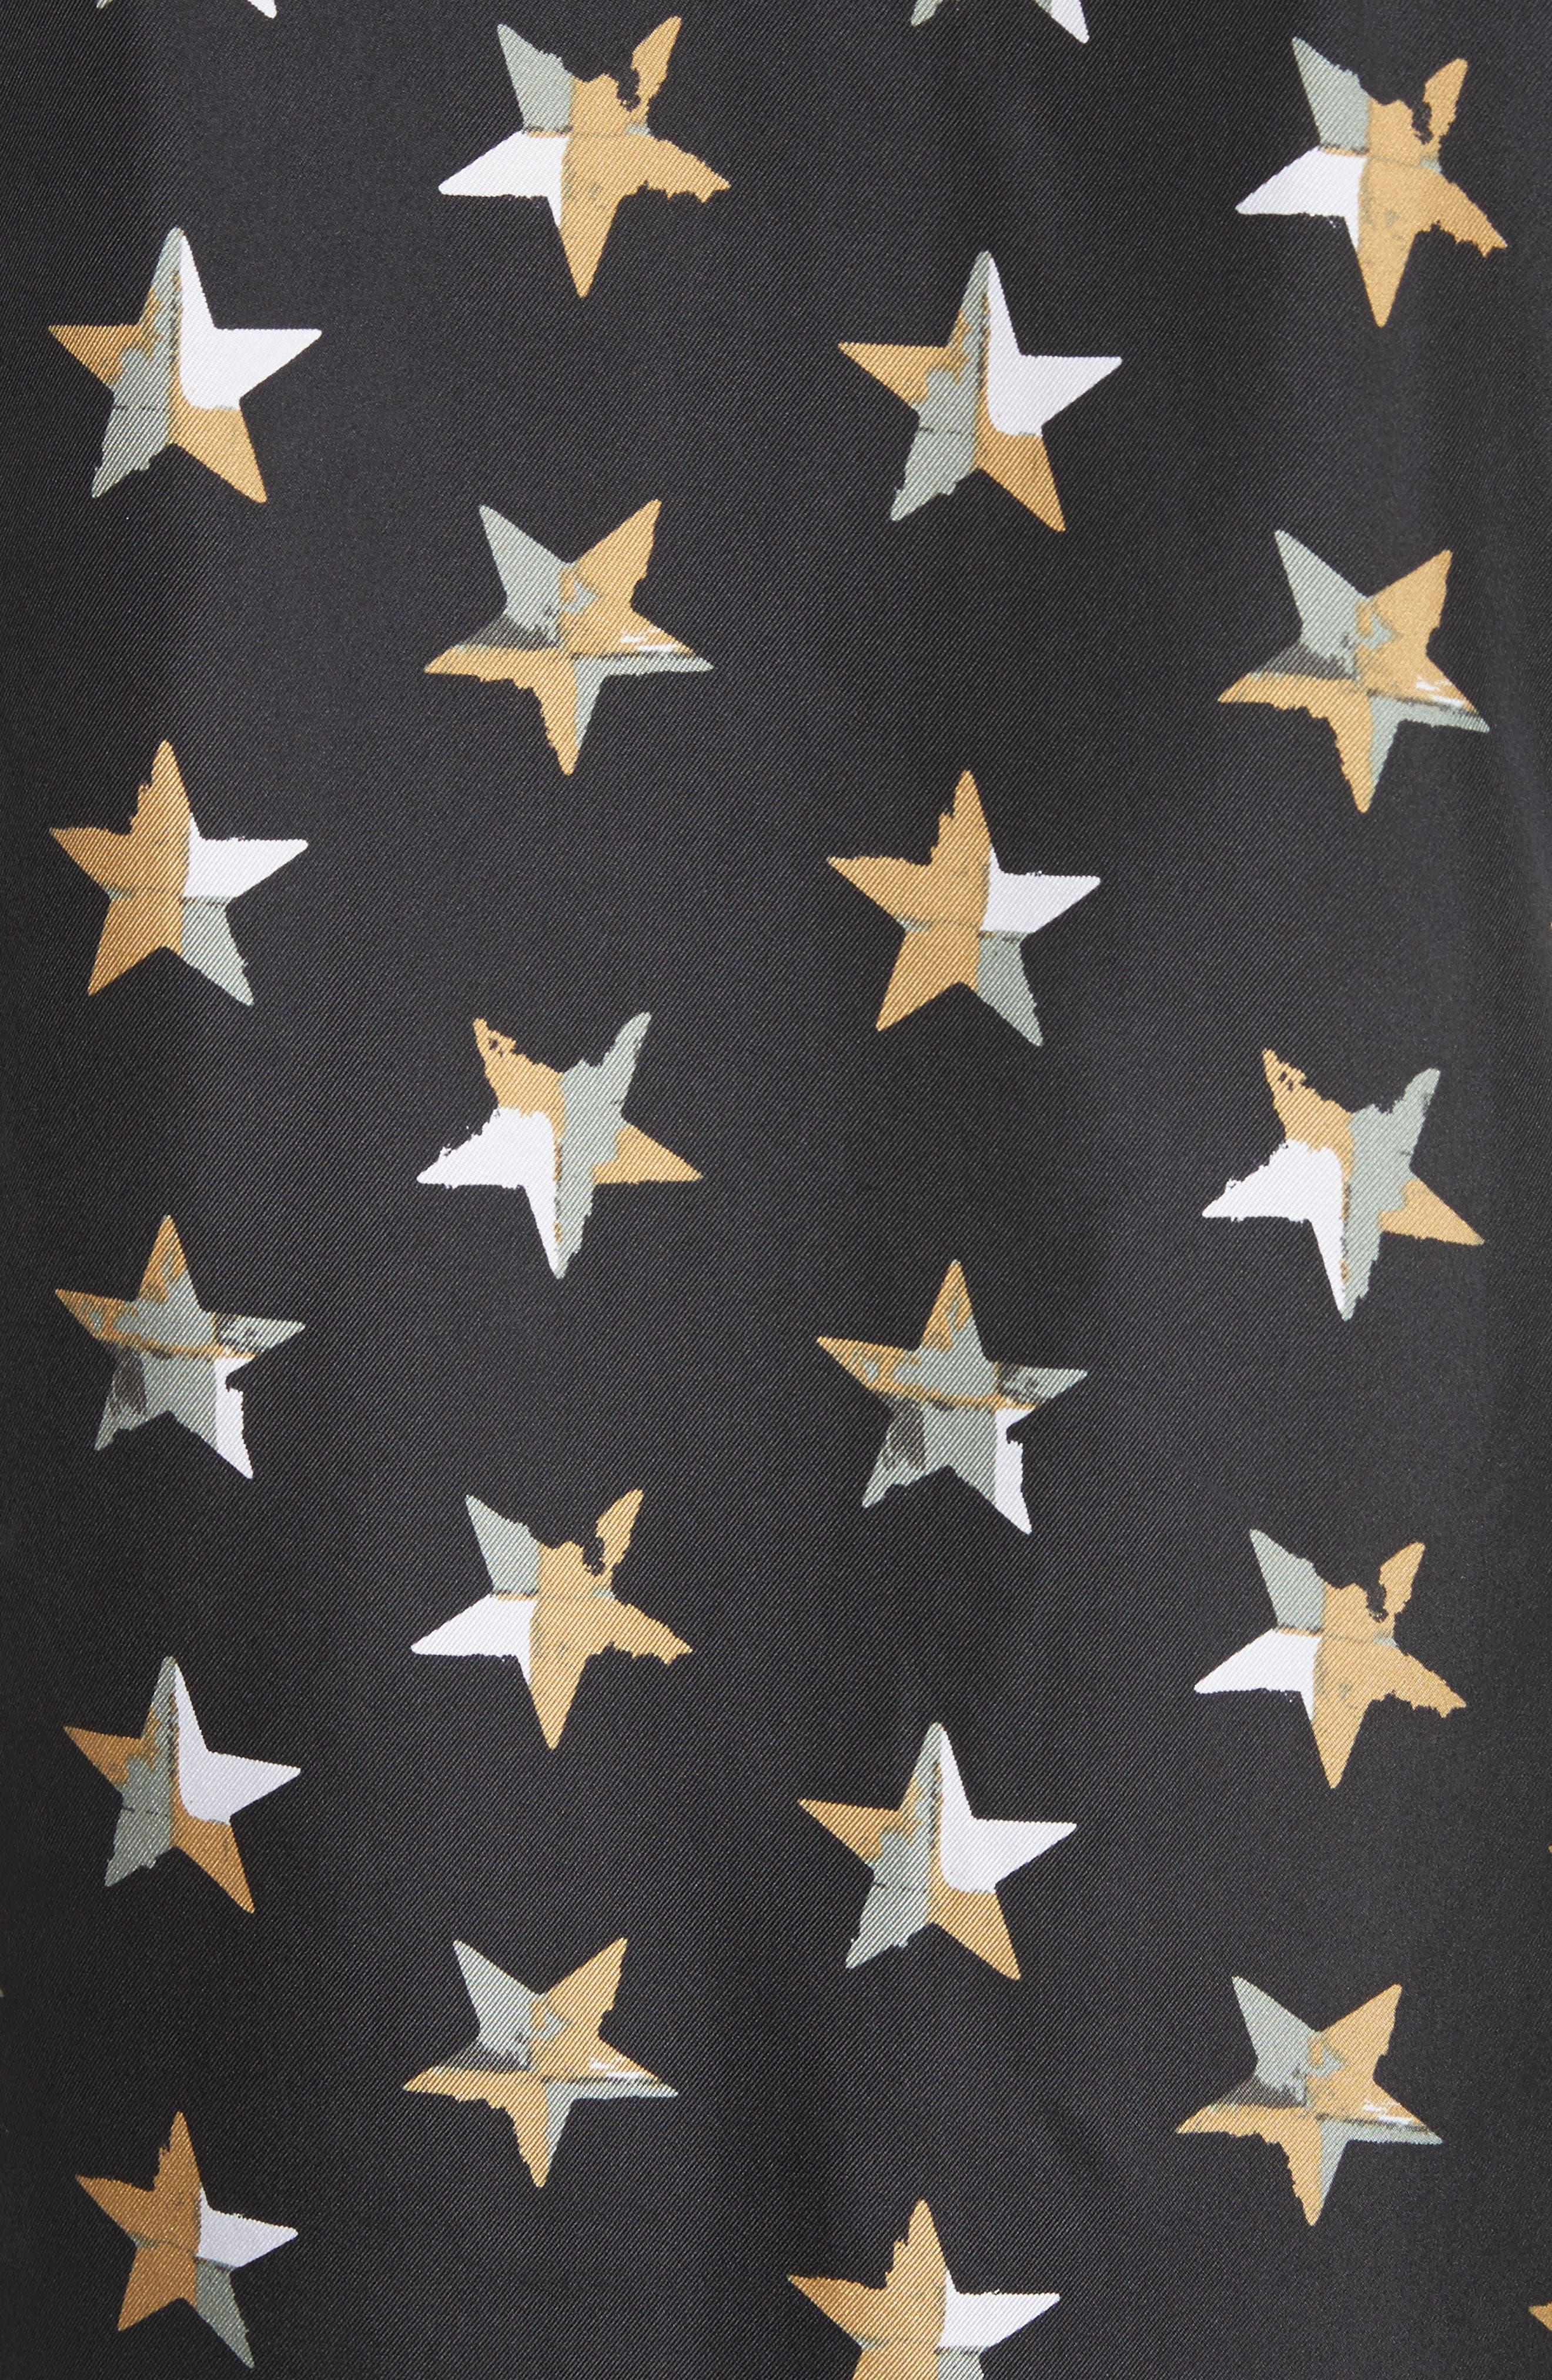 Brett Star Print Silk Shirtdress,                             Alternate thumbnail 5, color,                             006